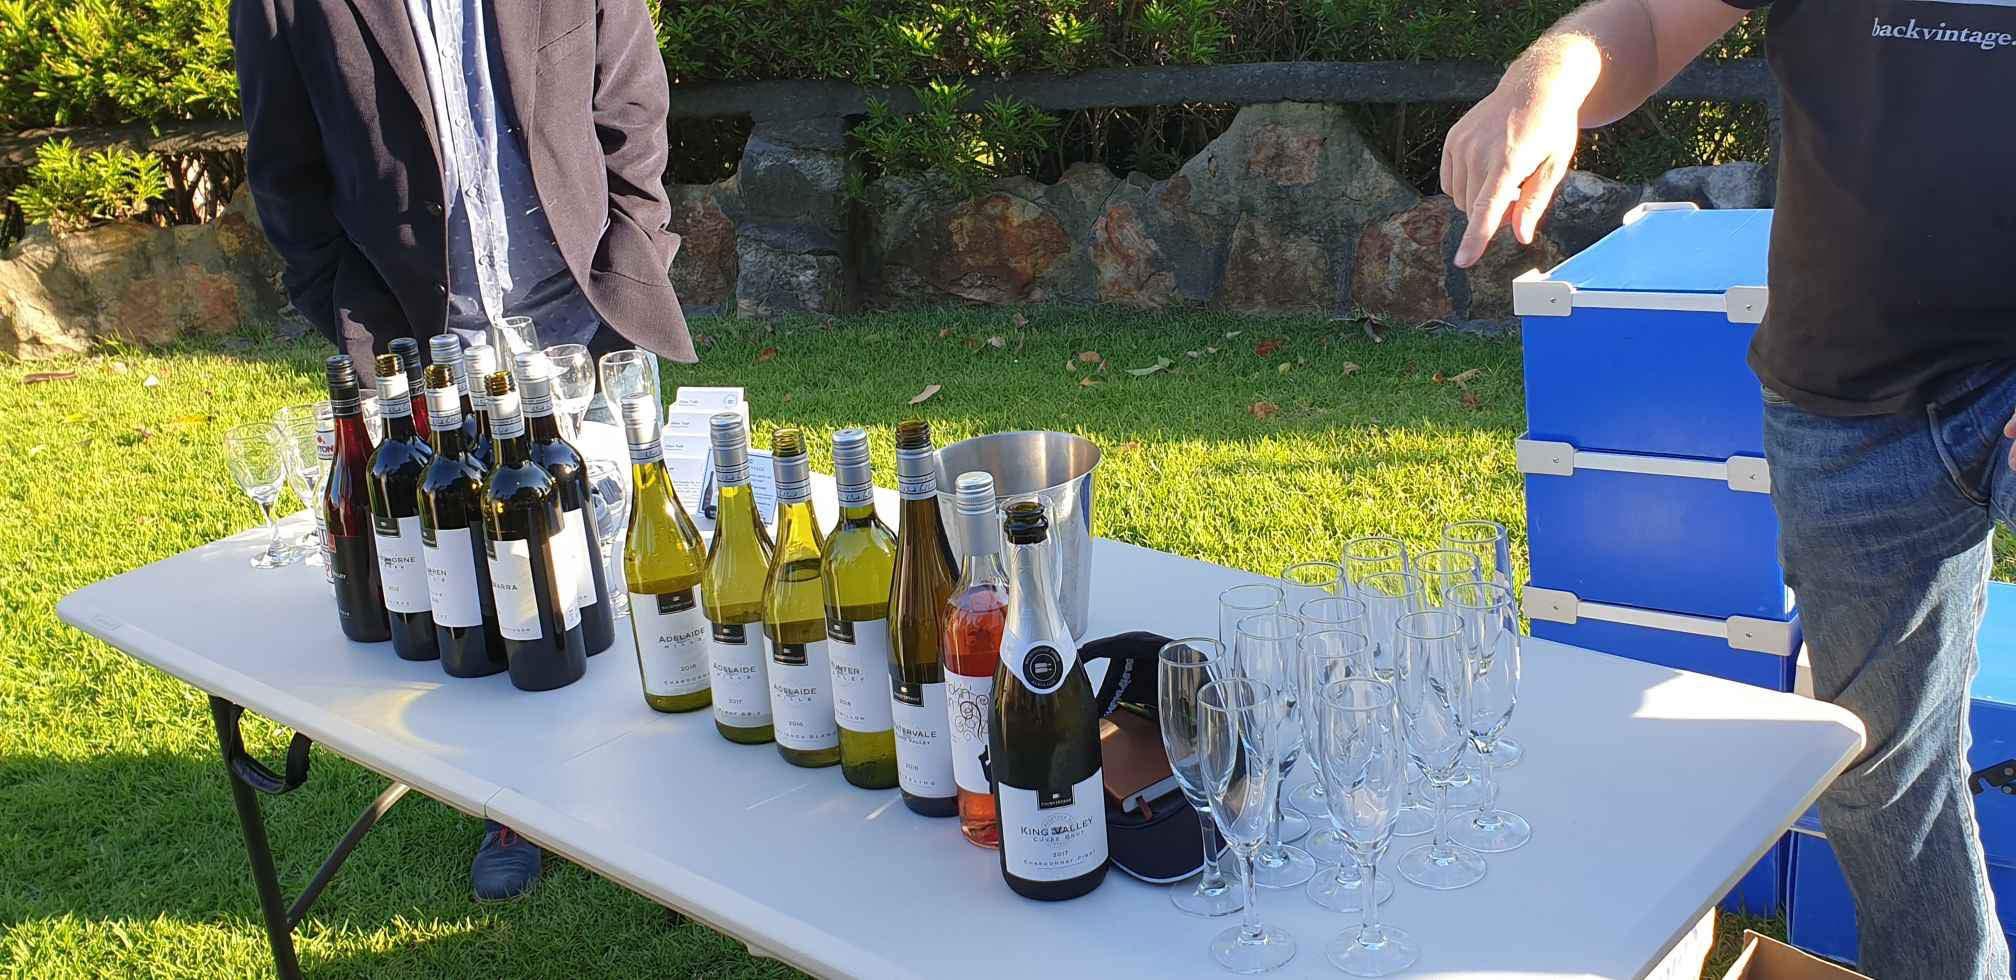 181207_FTCC_wine.jpg